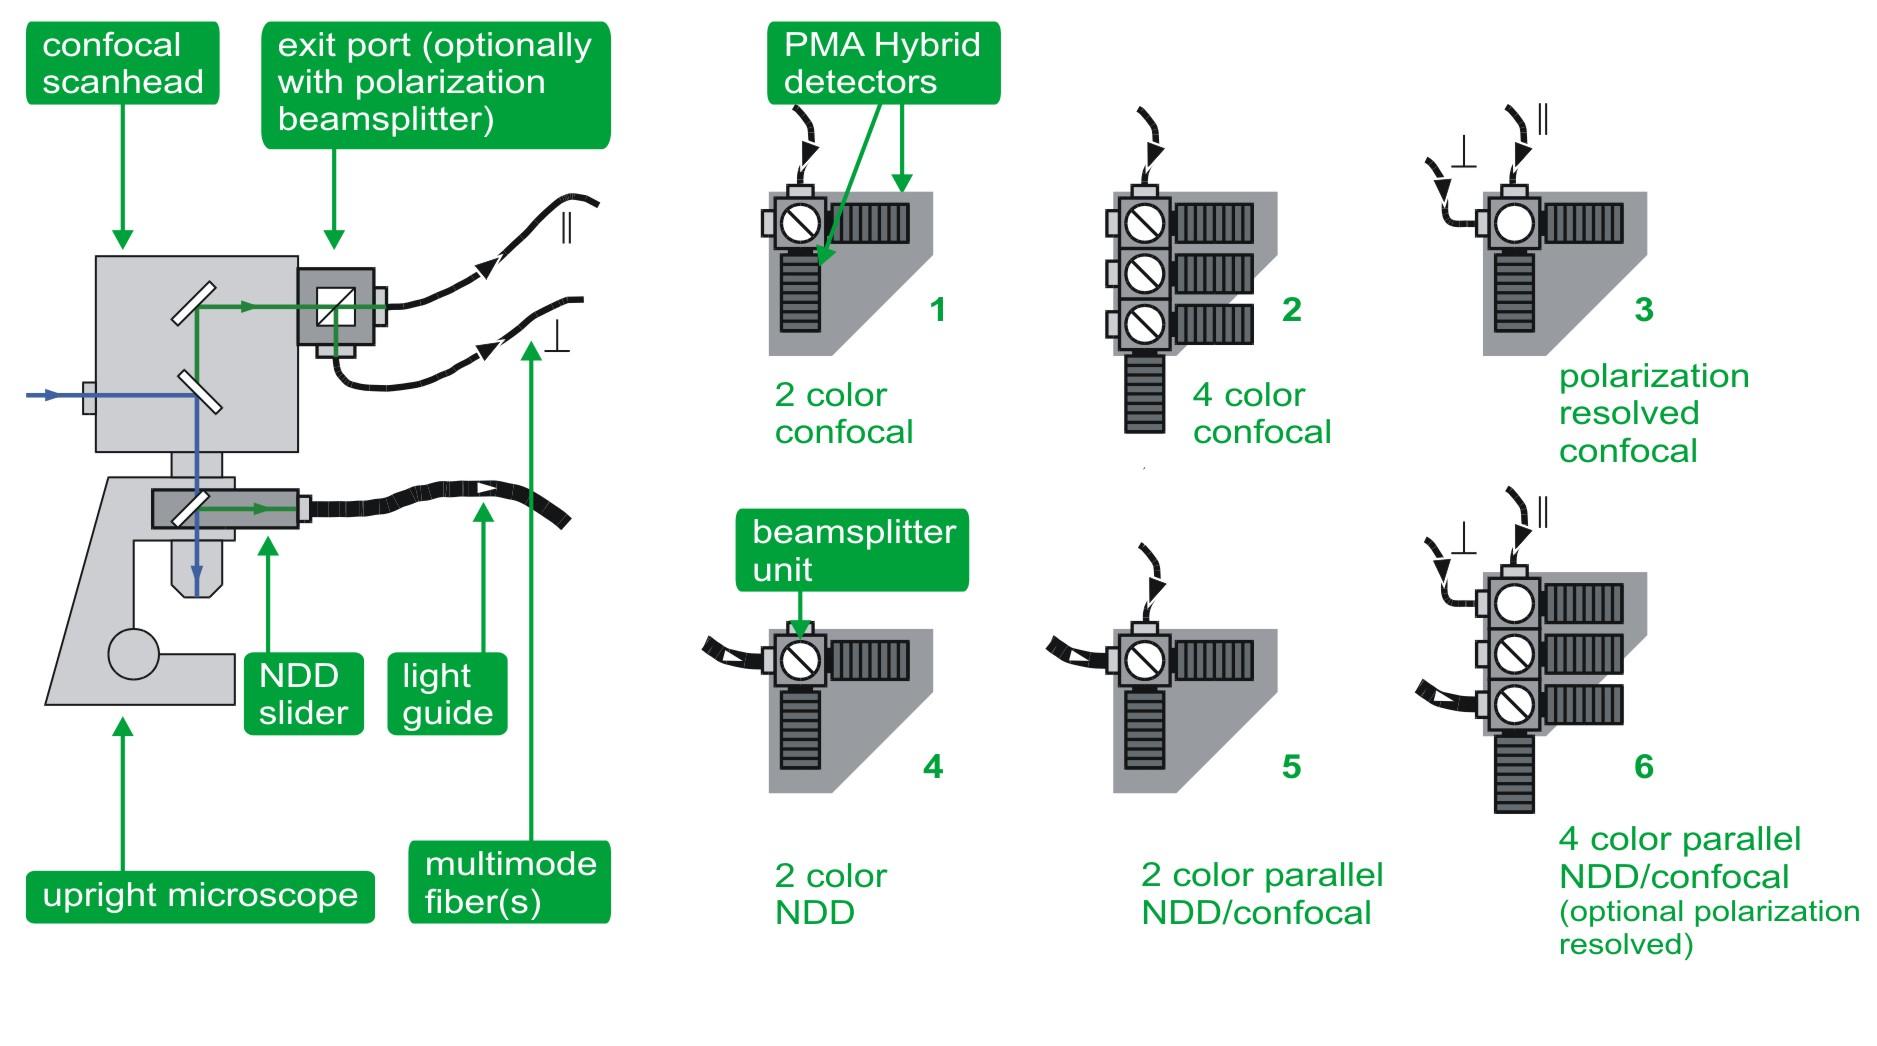 nikon a1 confocal microscope manual